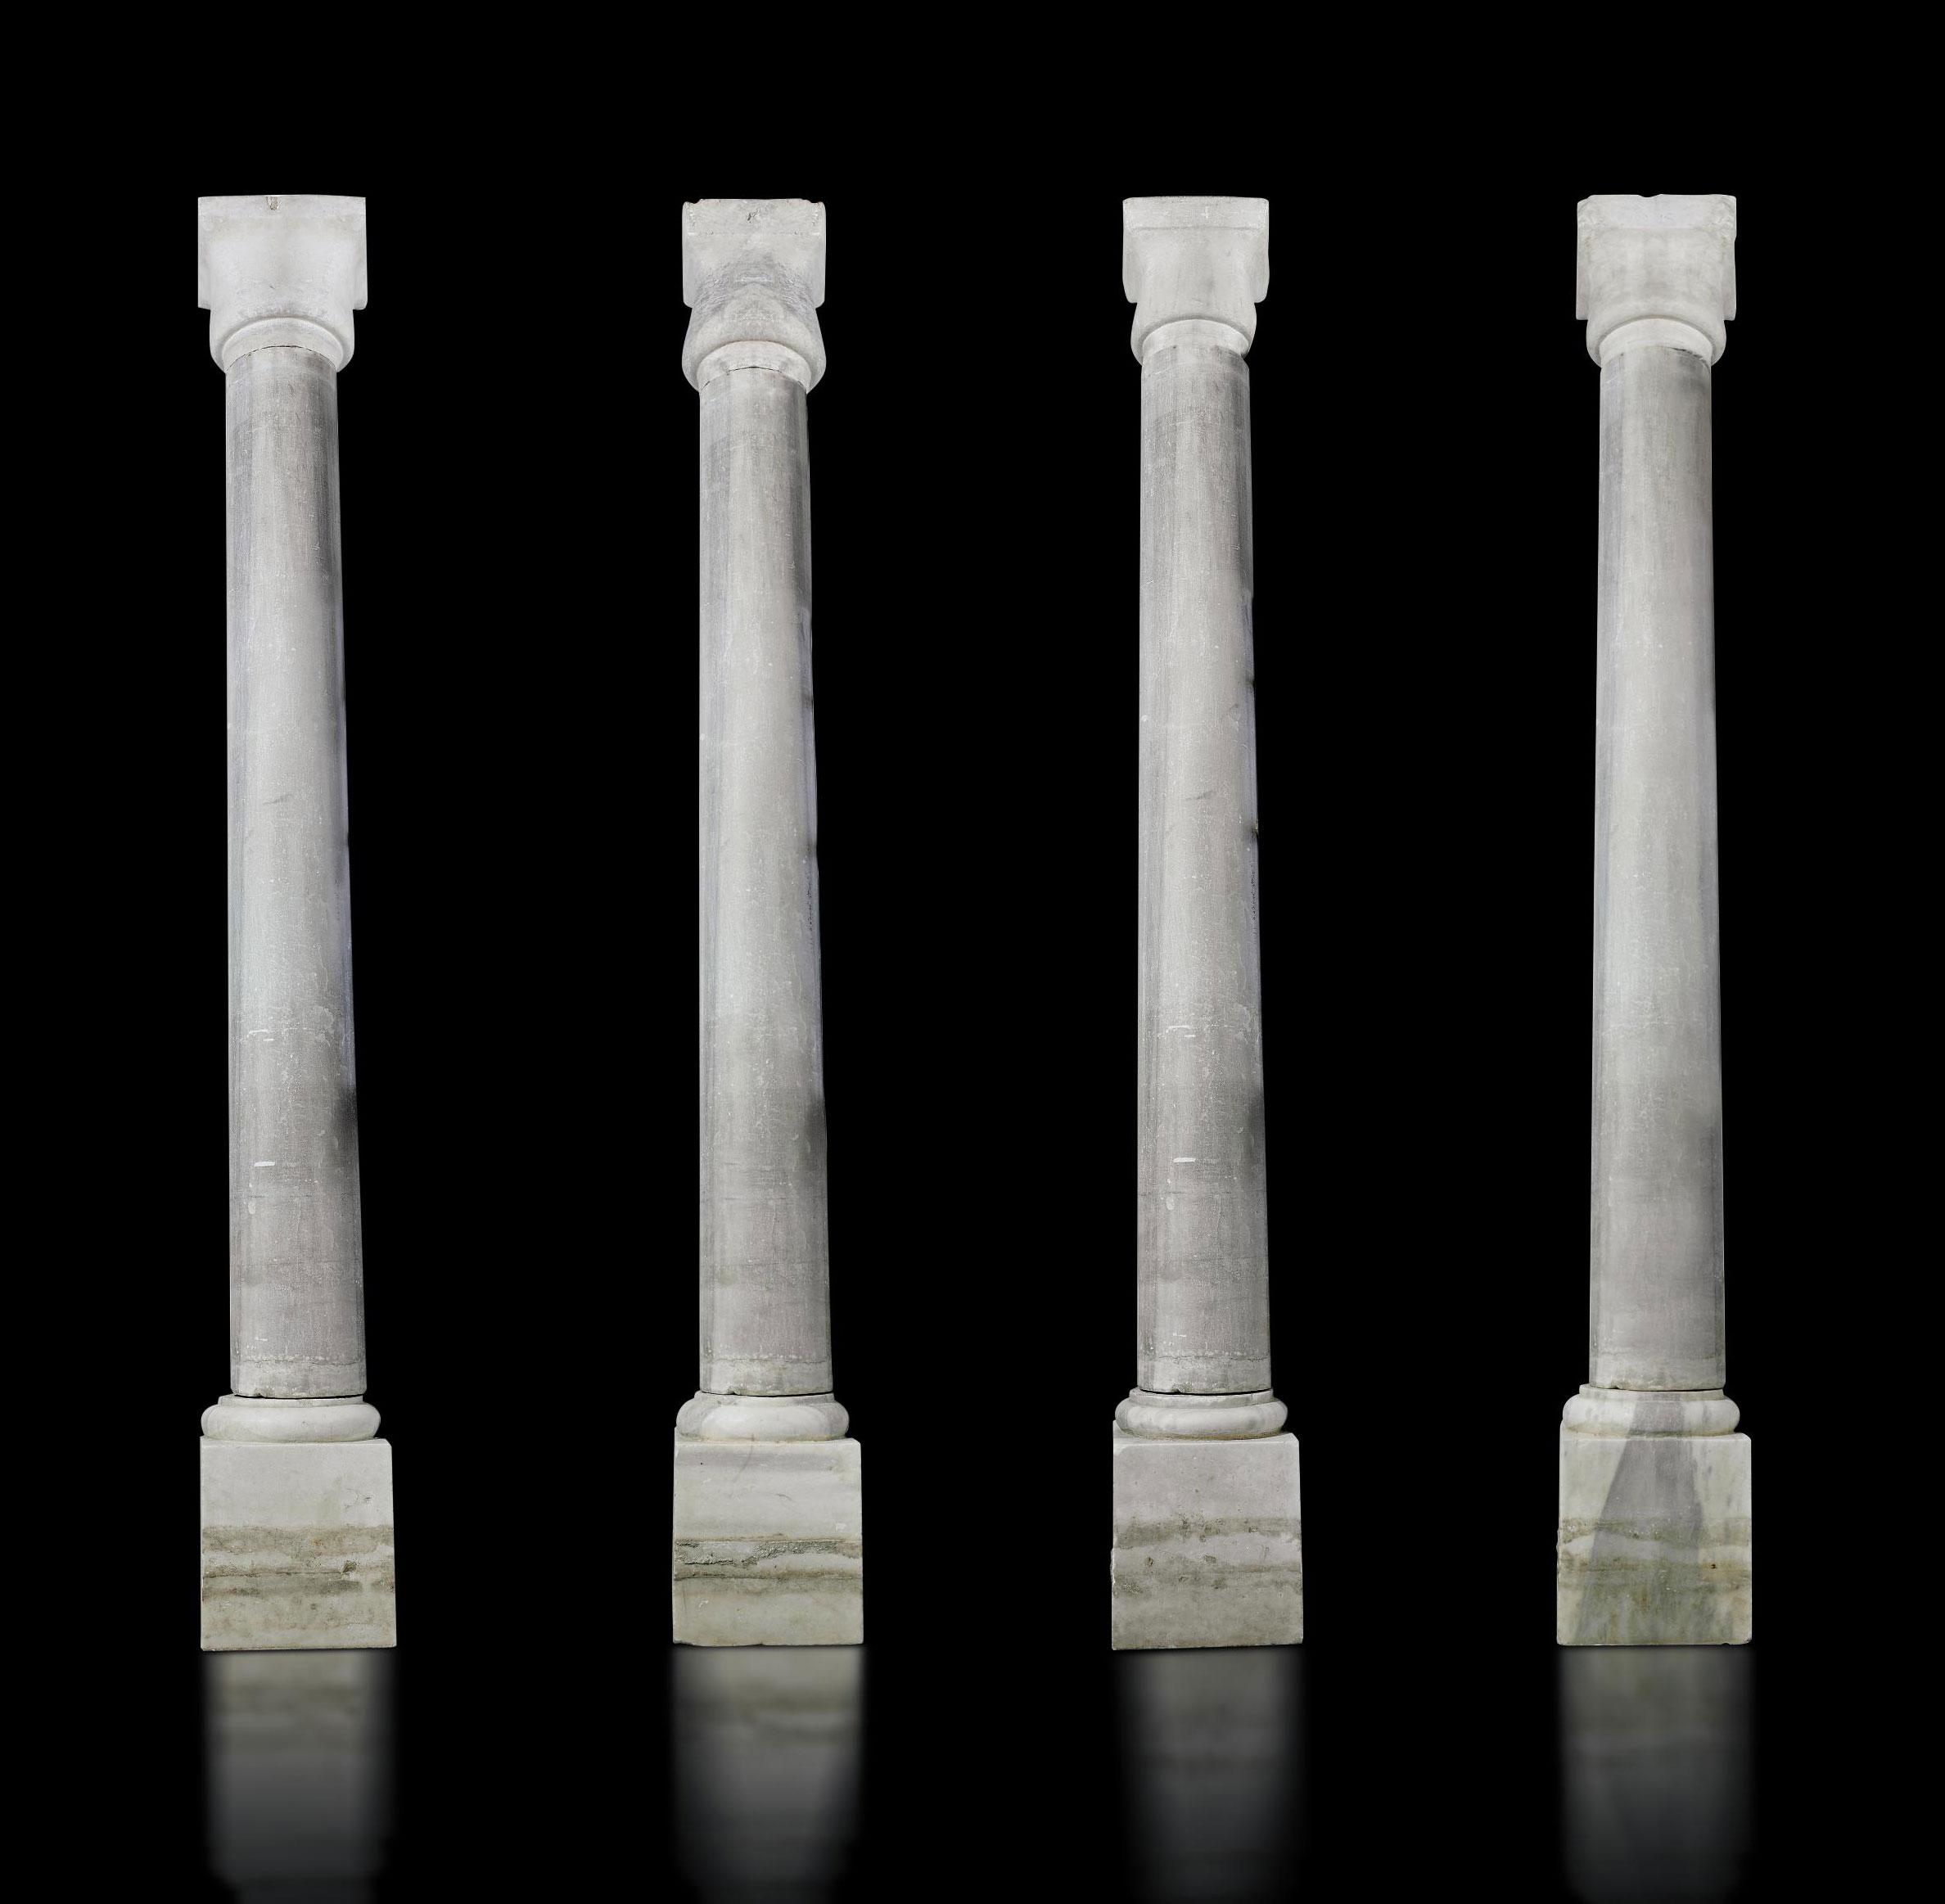 FOUR OTTOMAN ARCHITECTURAL MAR